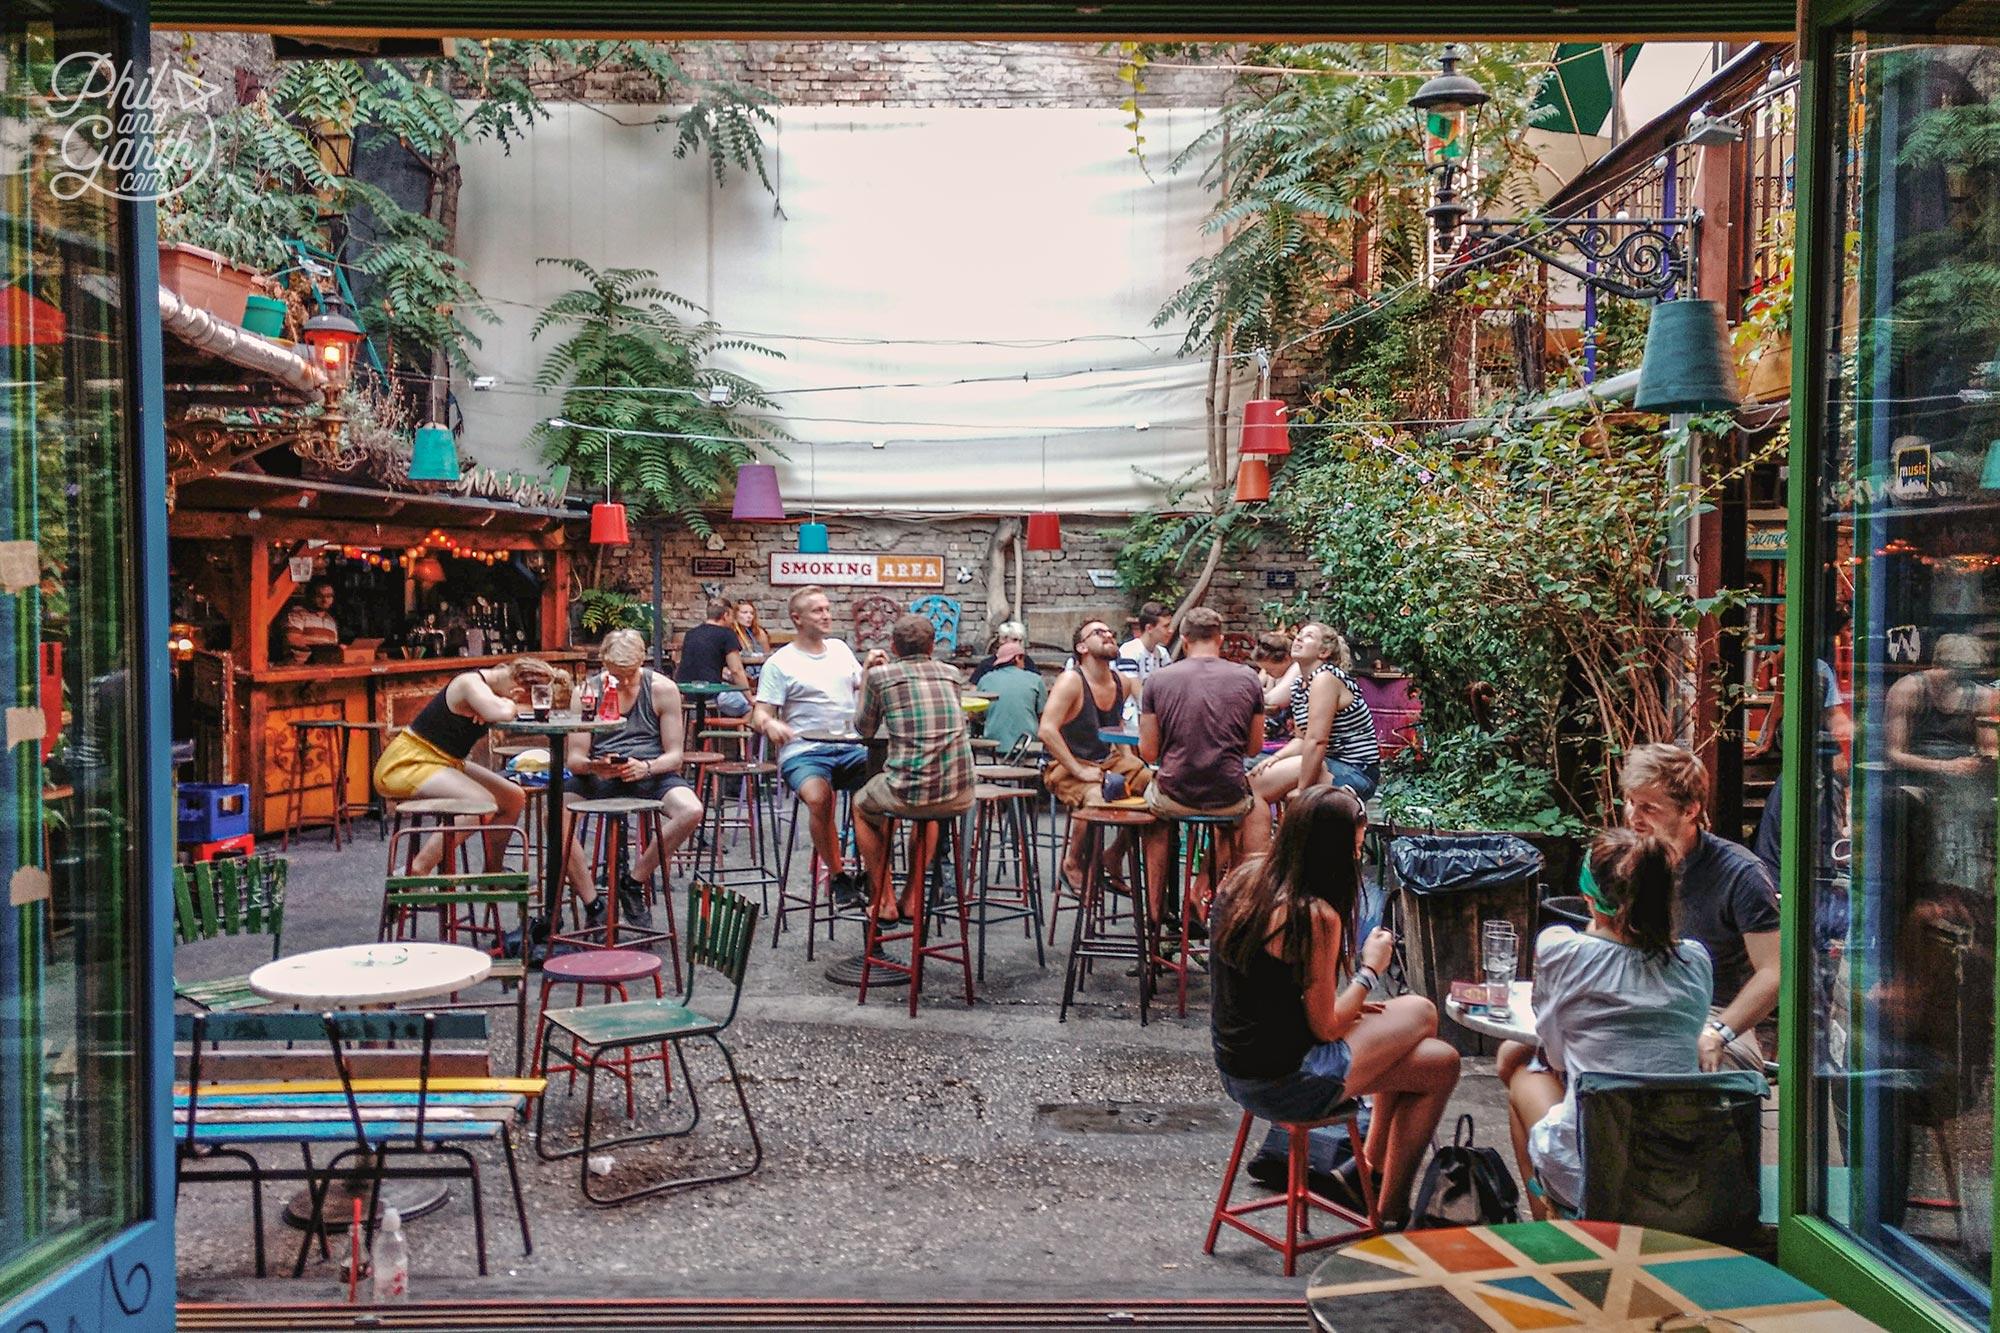 Szimpla Kert - One of Budapest's Ruin bars